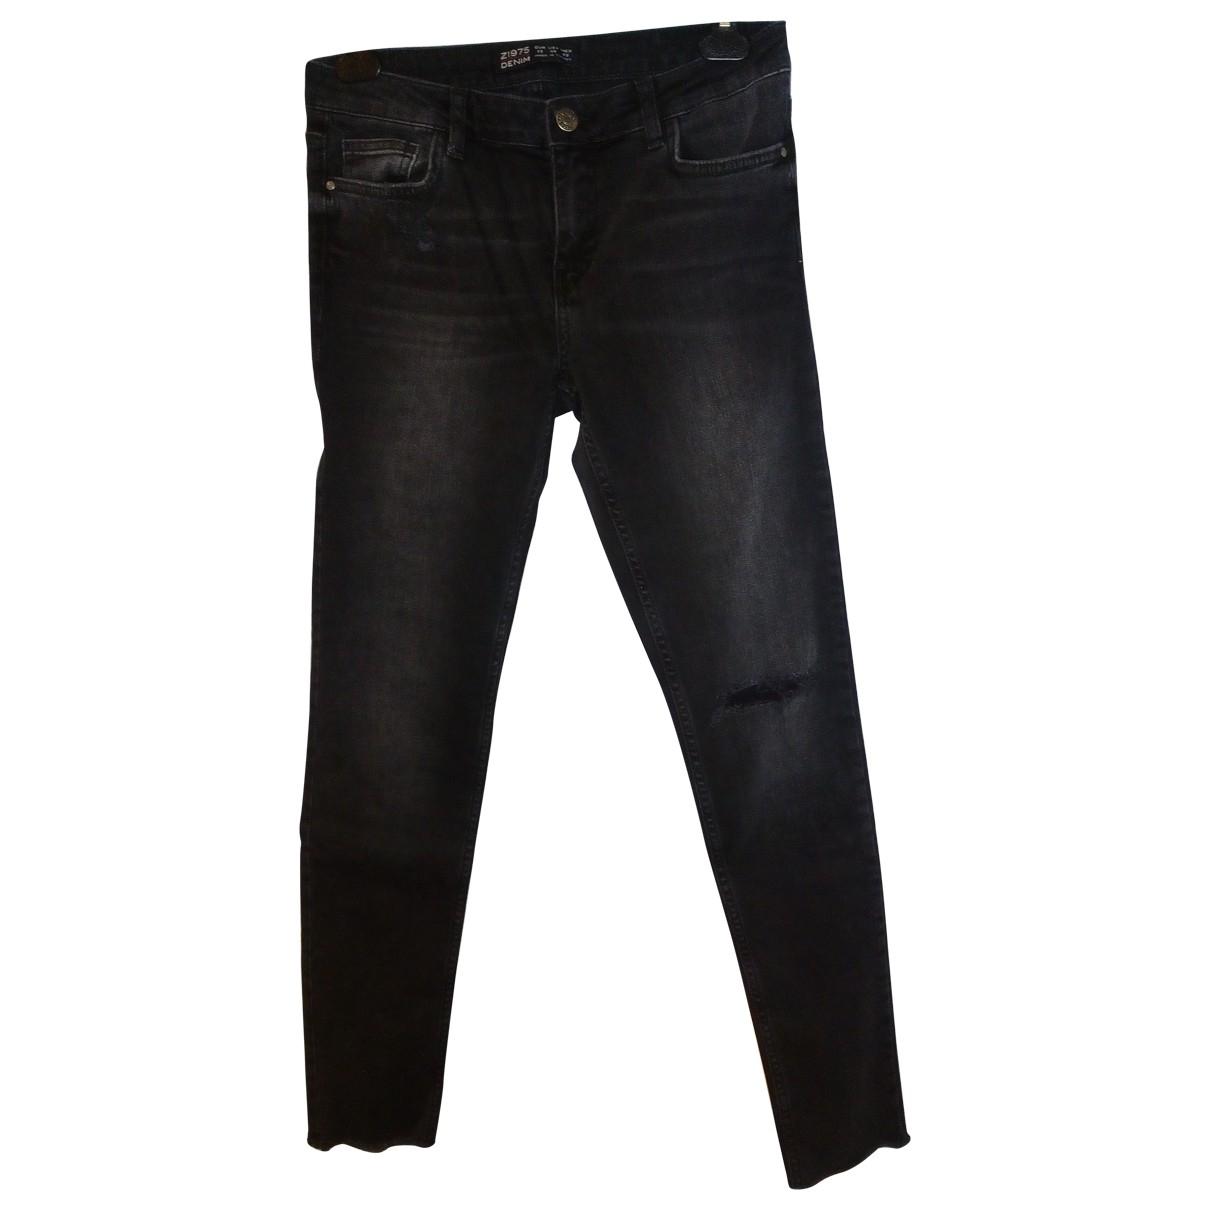 Zara \N Black Cotton - elasthane Jeans for Women 38 FR